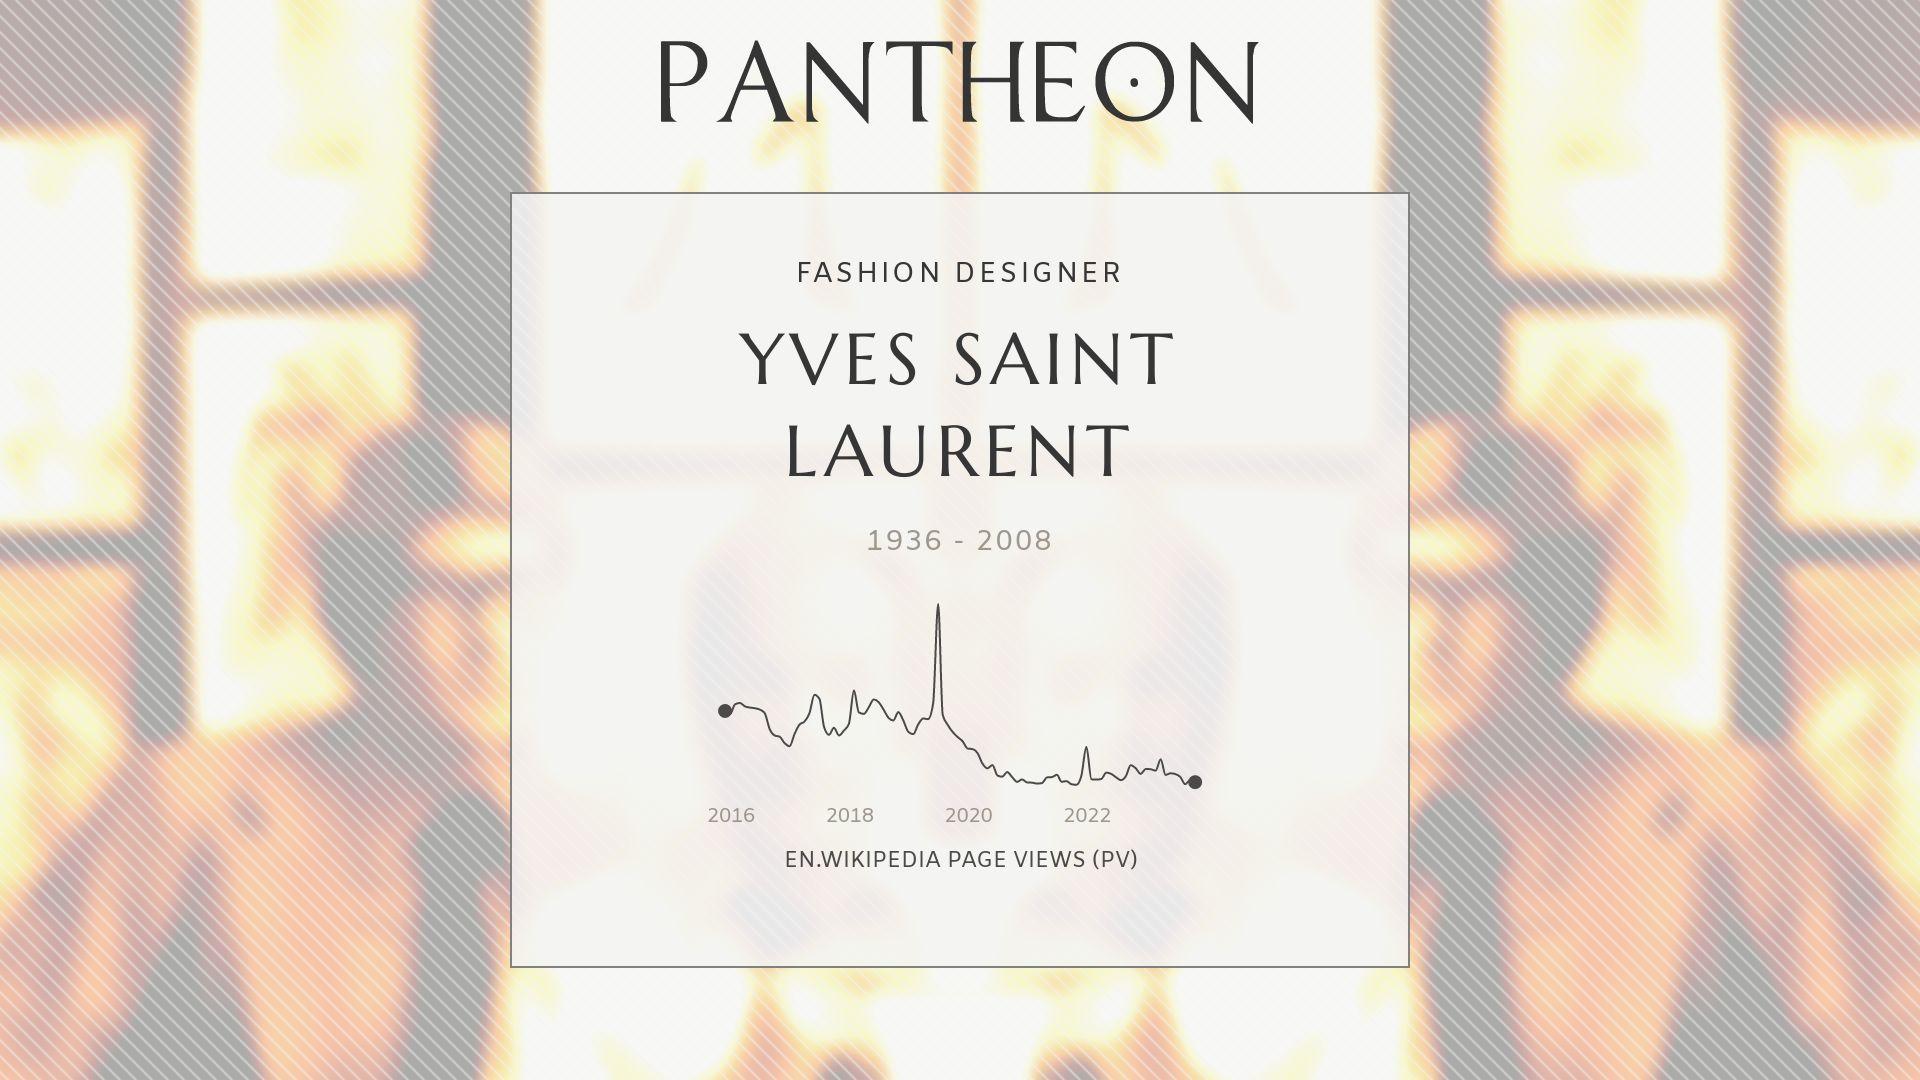 Yves Saint Laurent Biography Pantheon